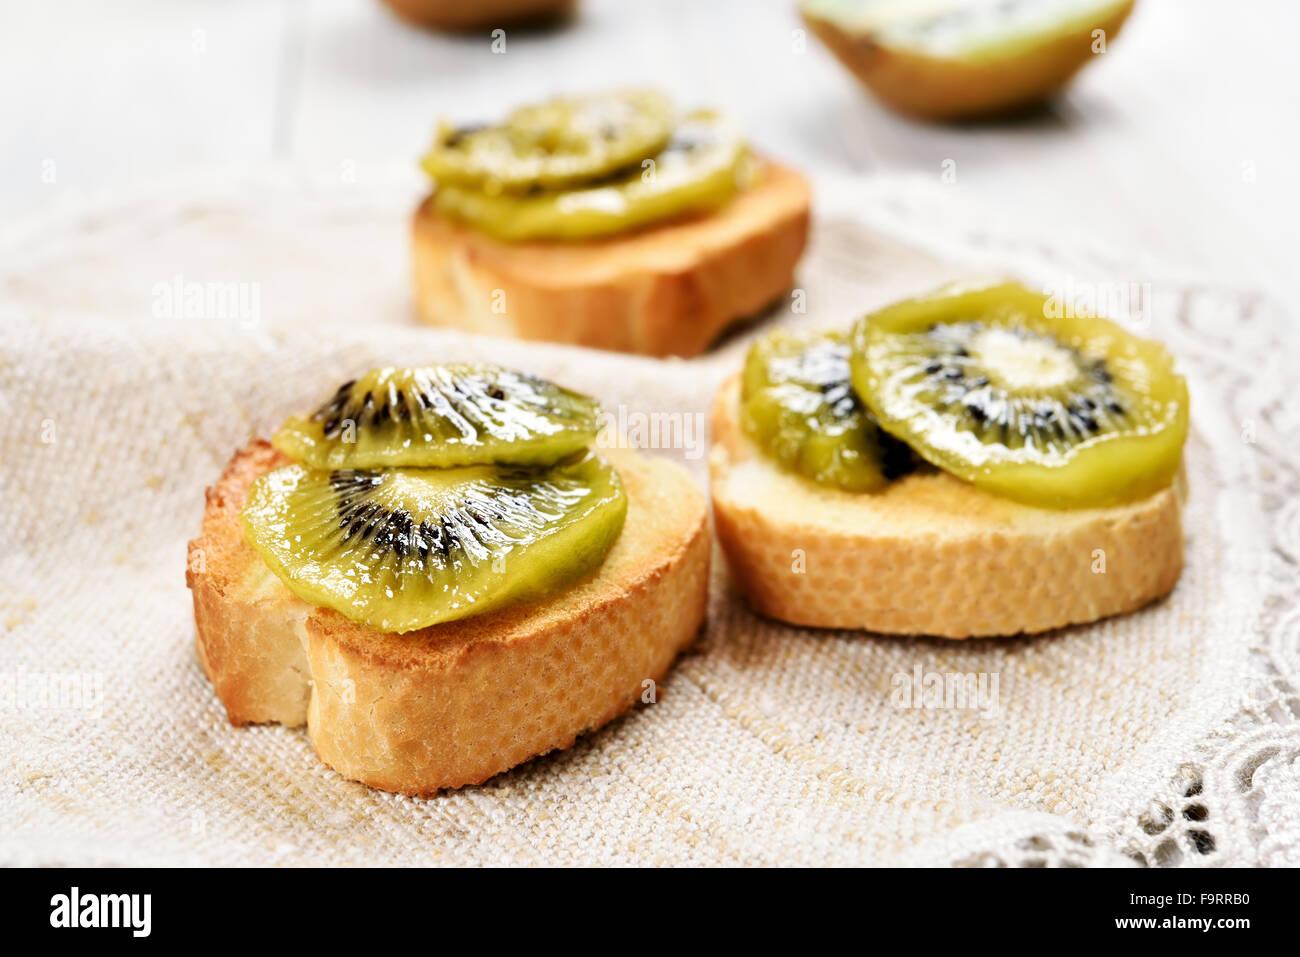 Kiwi jam on bread over napkin - Stock Image